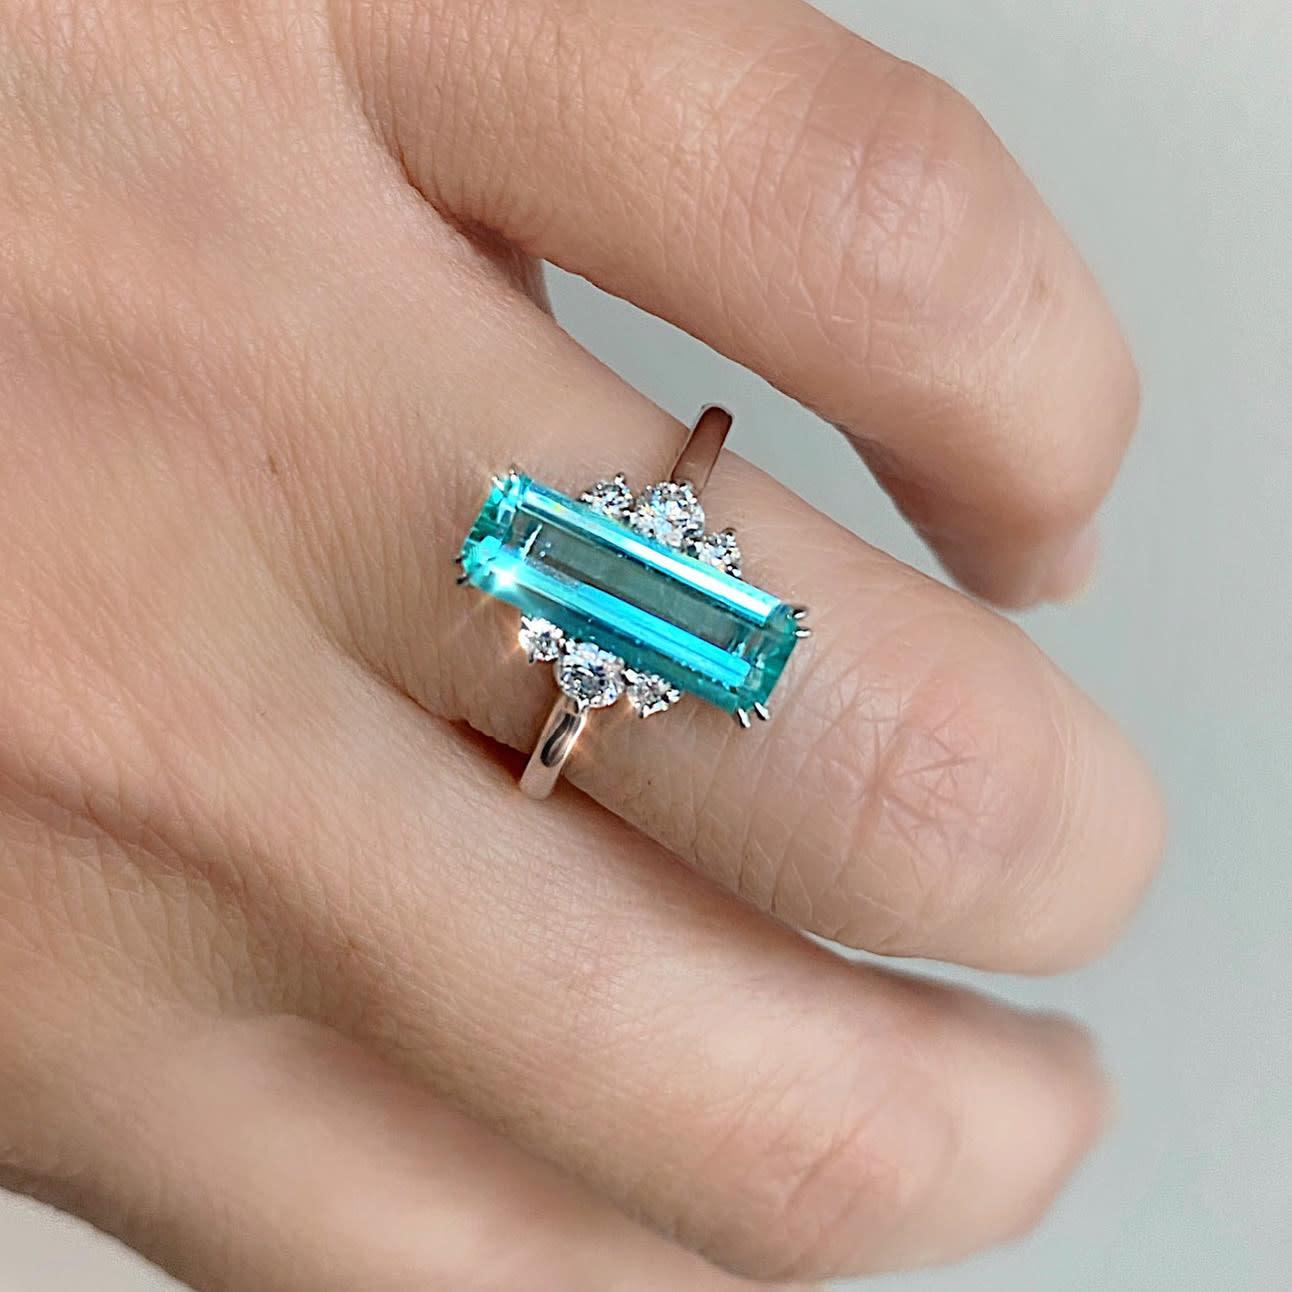 Trabert Goldsmiths 1.78ct Emerald Cut Paraiba Aquamarine Ring